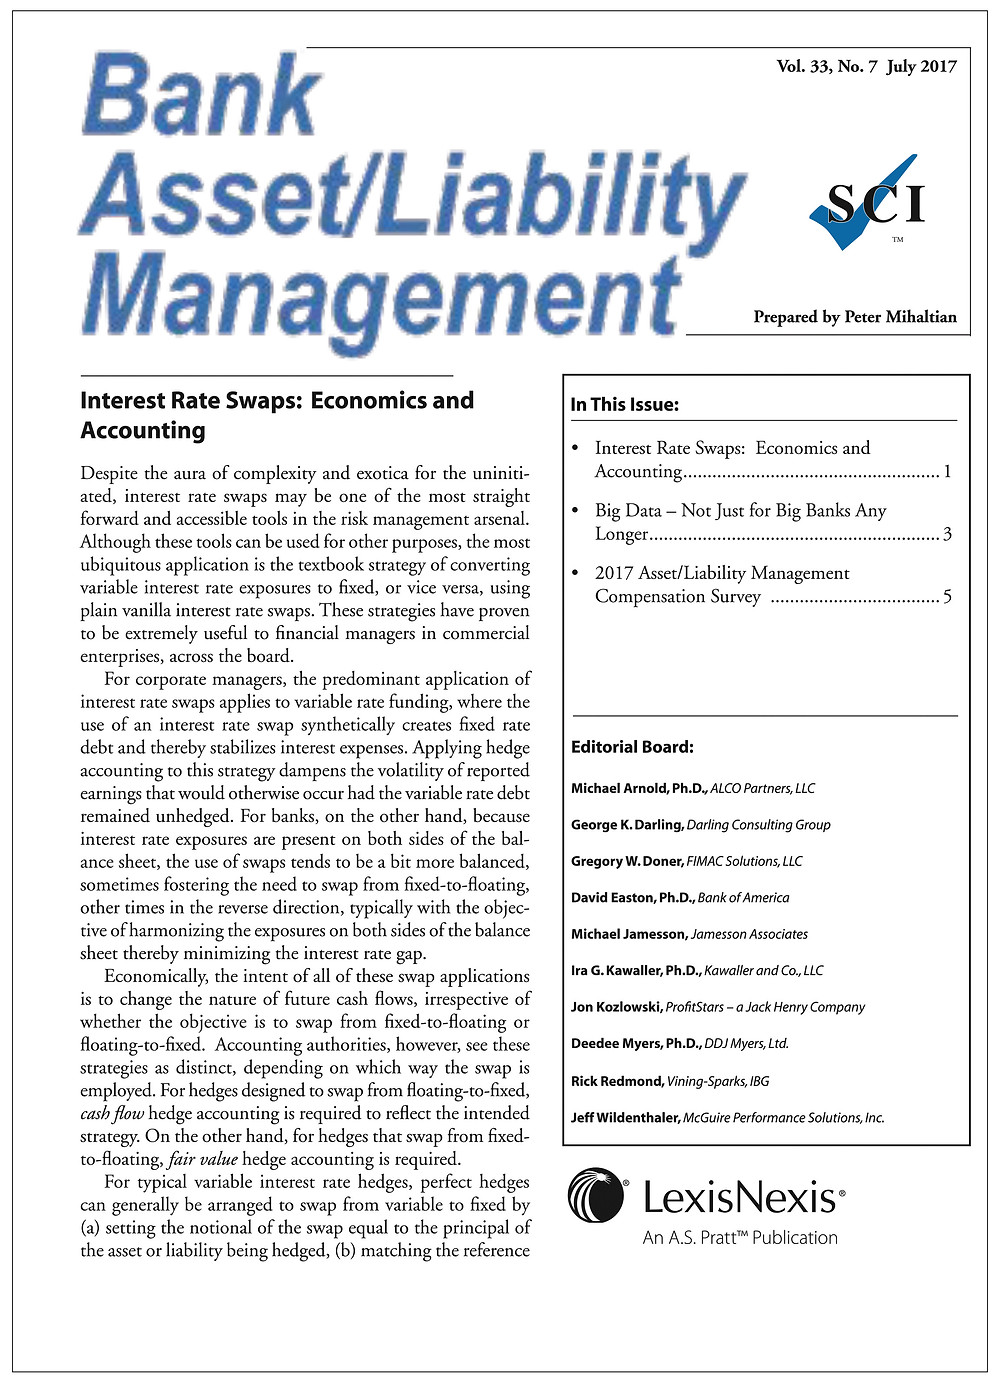 Bank Asset / Liability Management